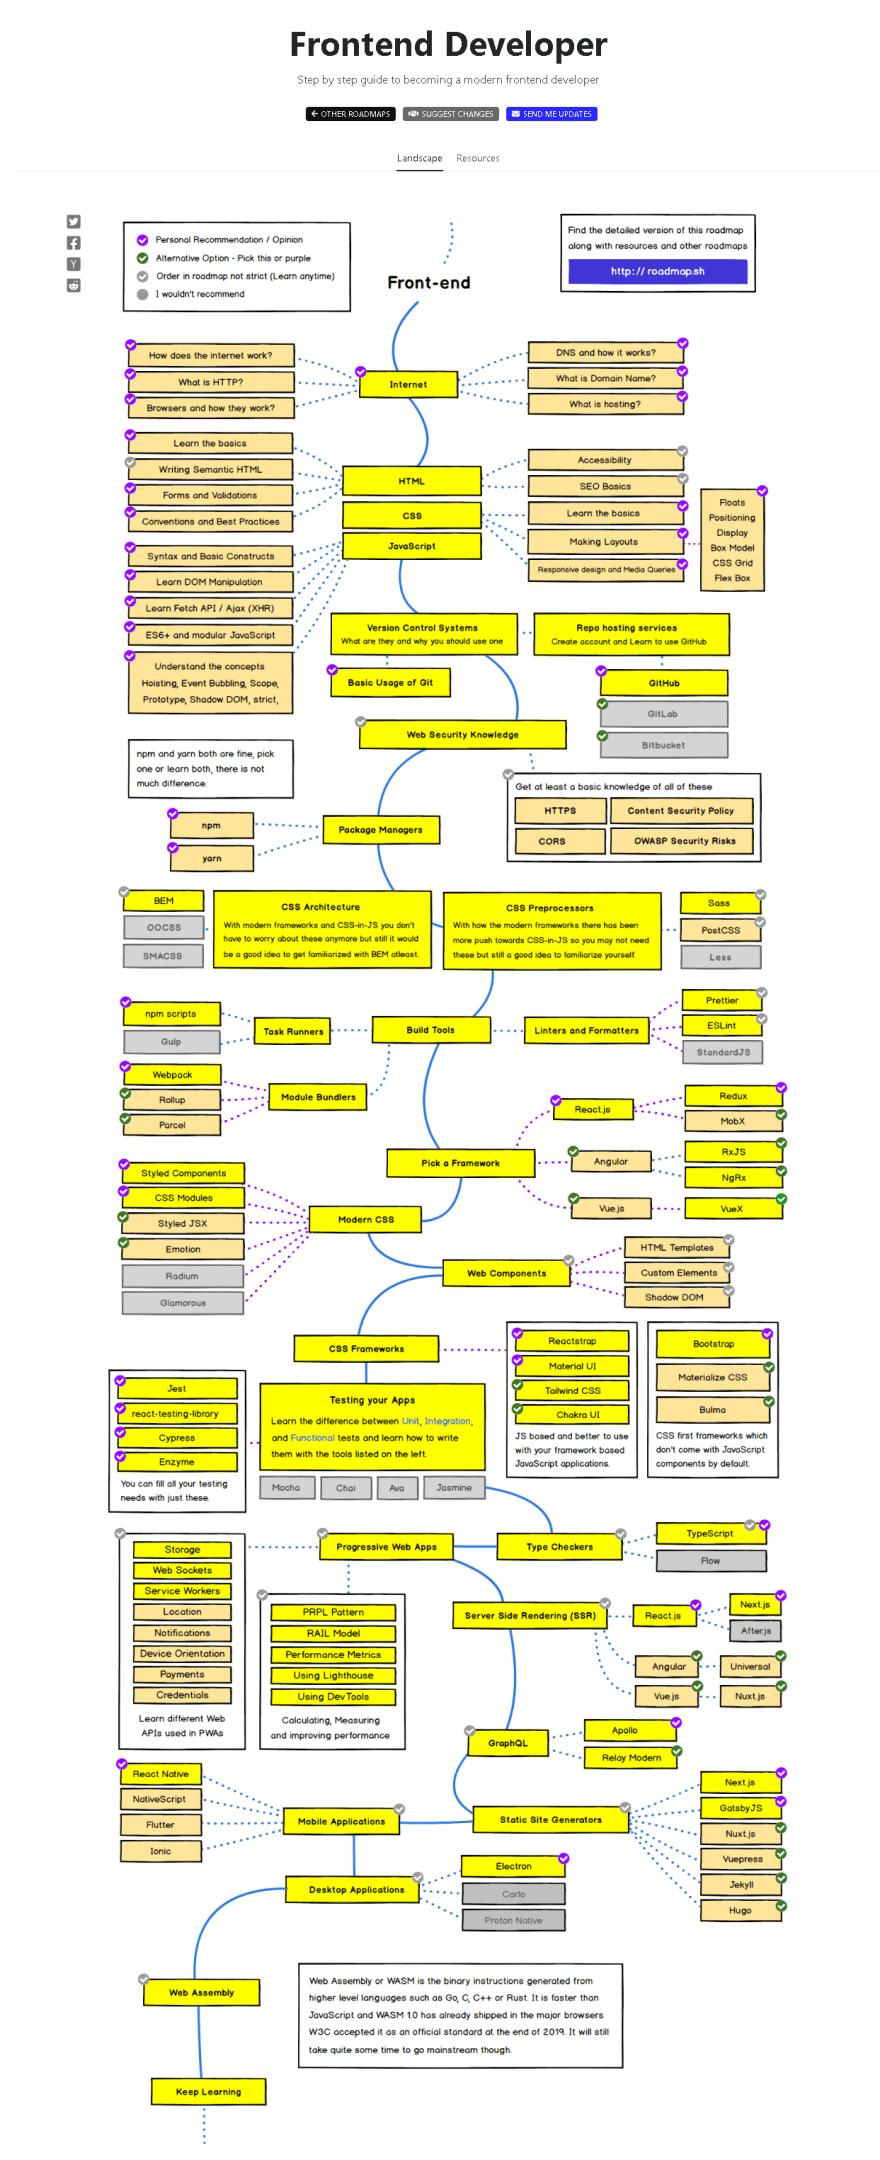 Roadmap of Frontend Developer